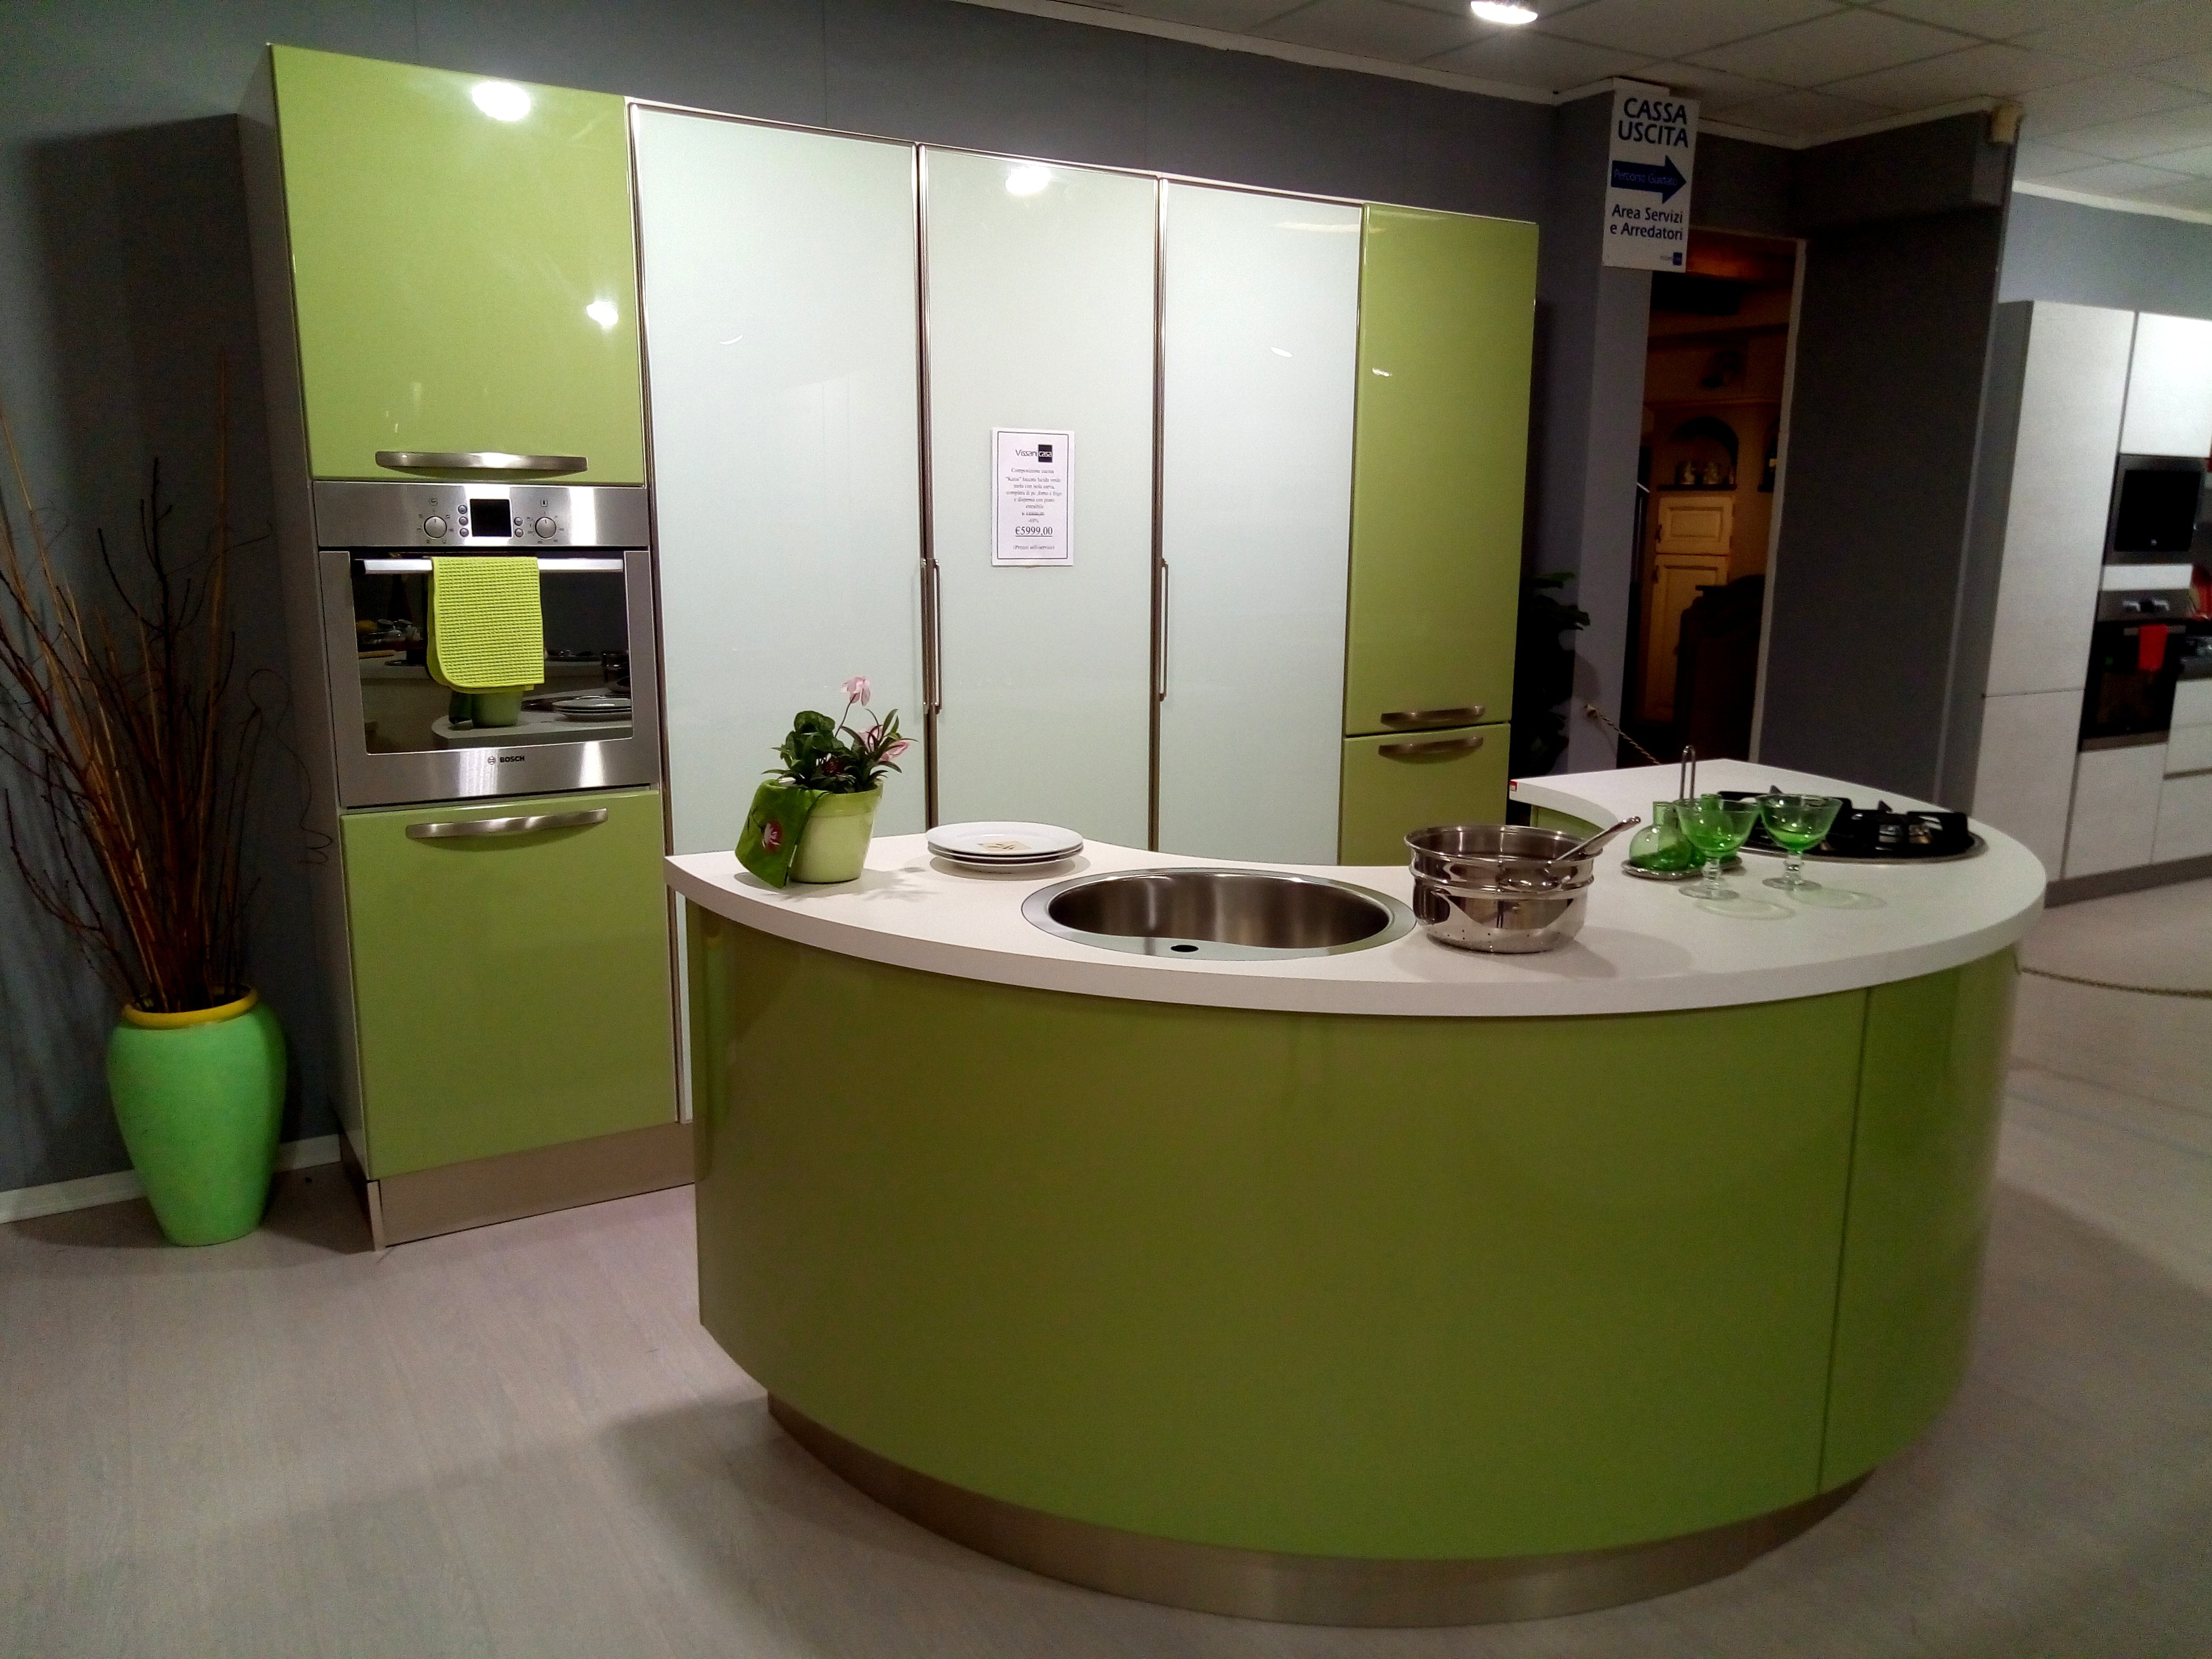 Cucina Lube Katia laccata verde mela - Vissani Casa